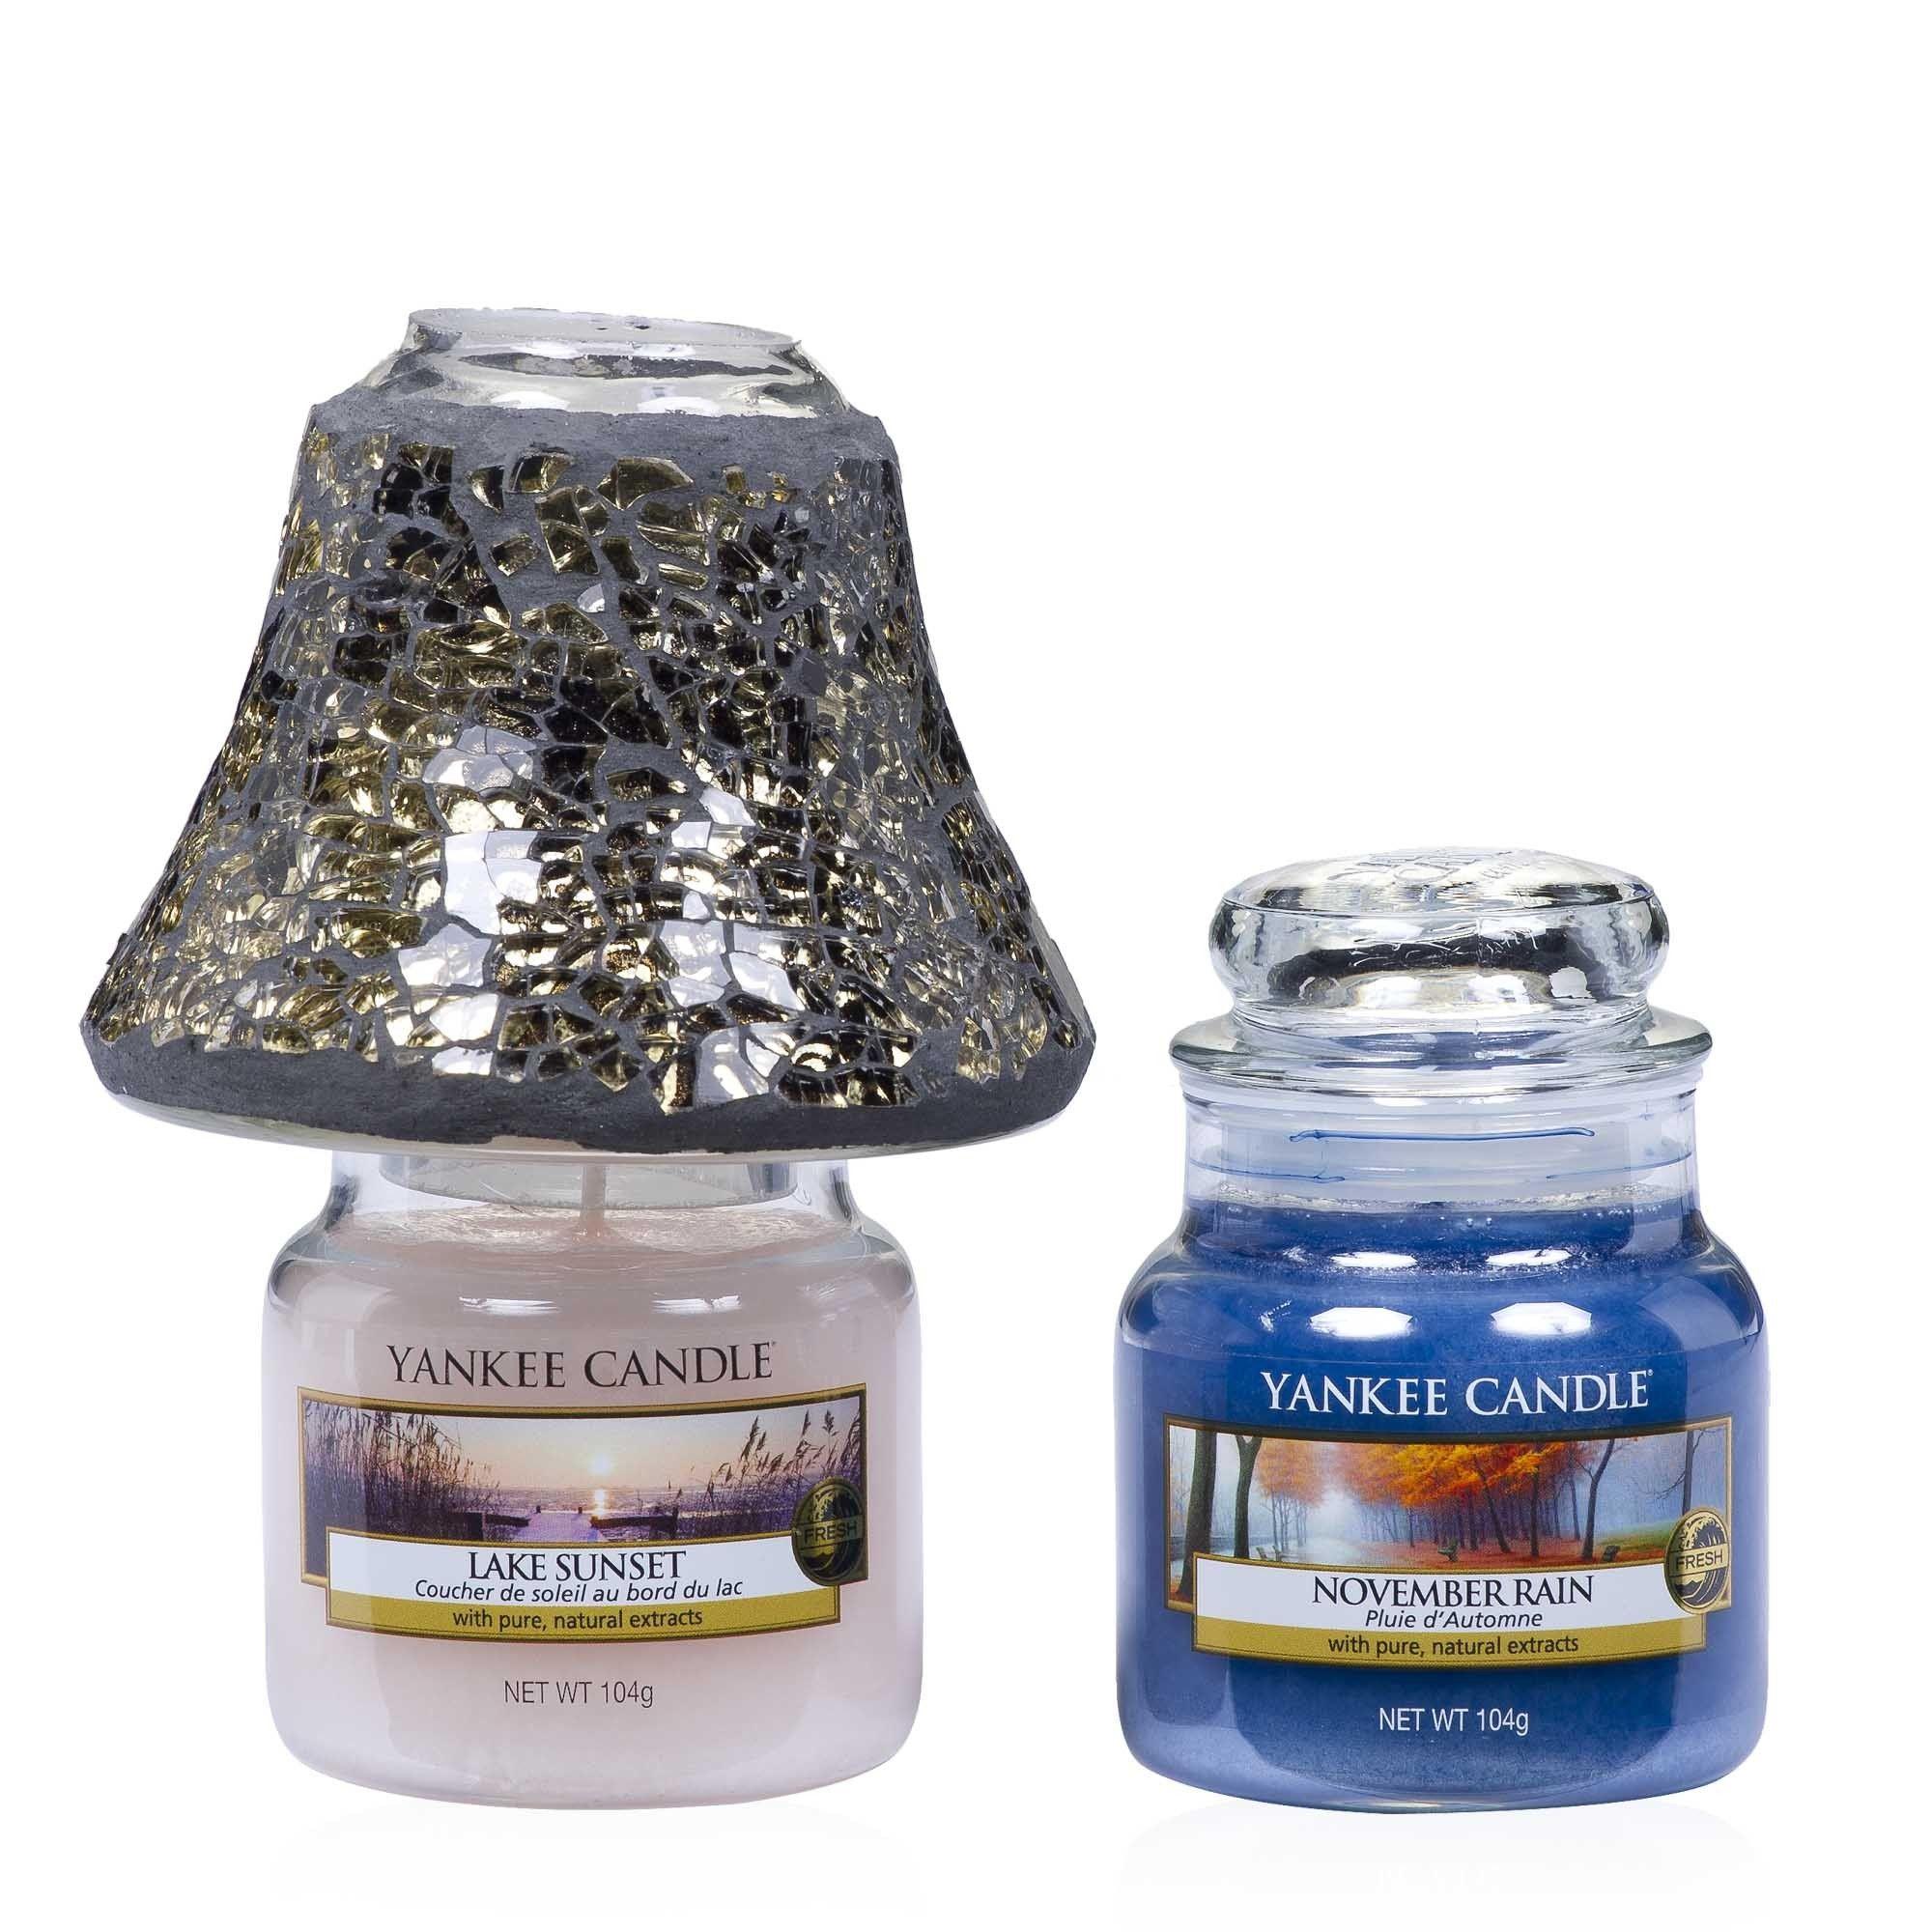 Yankee Candle Duftkerze Housewarmer kleines Glas 104g  Lake Sunset